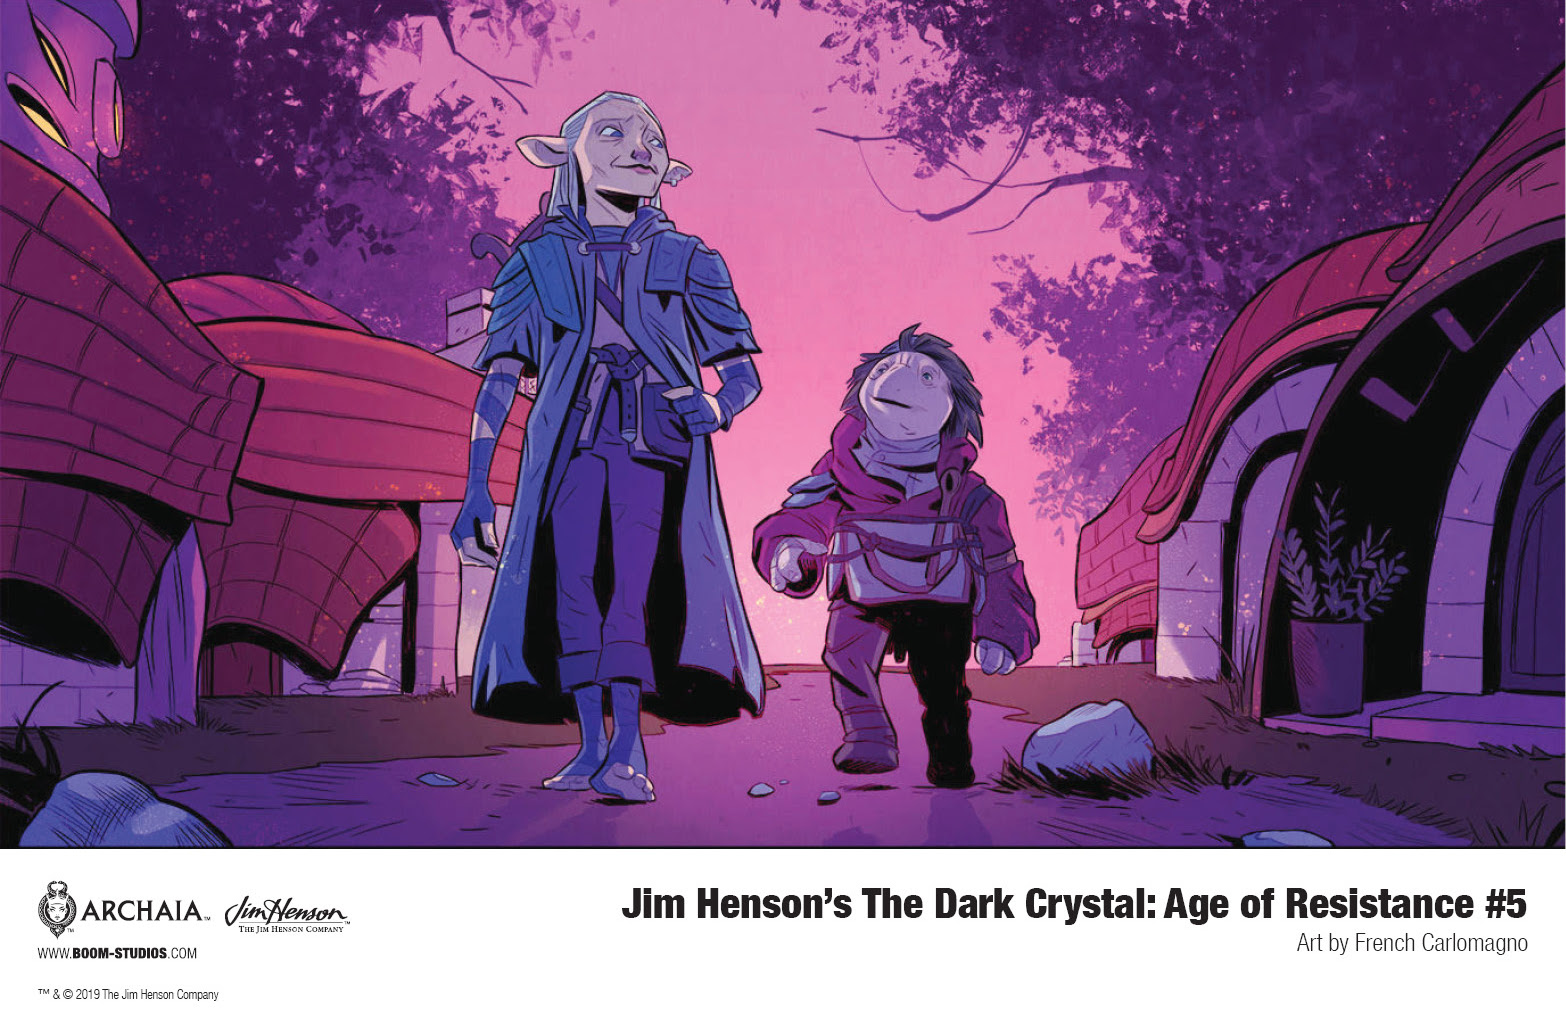 Jim Henson's The Dark Crystal: Age of Resistance #5